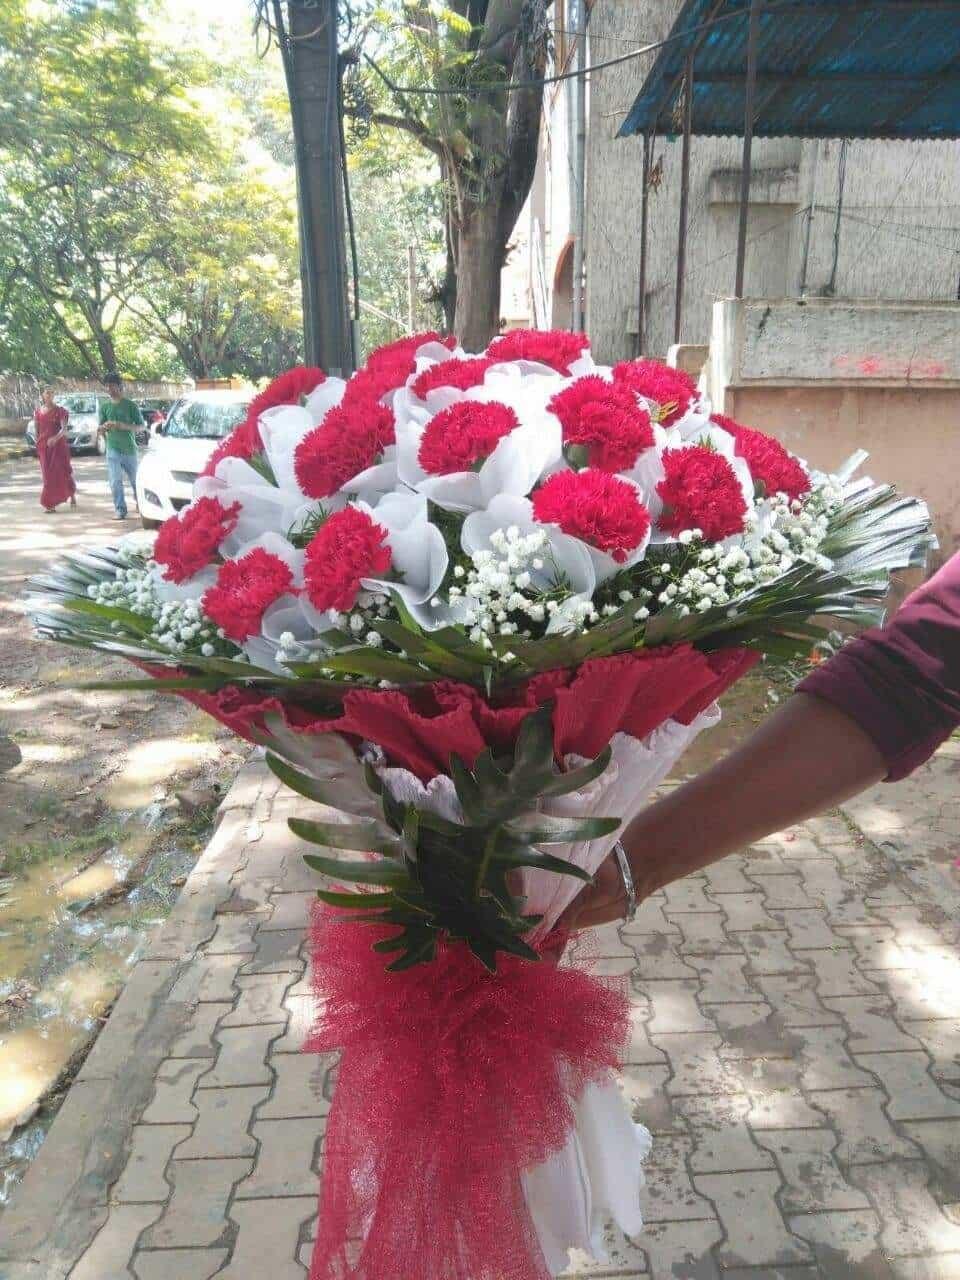 Krishna Florist, Kasturi Nagar - Florists in Bangalore - Justdial